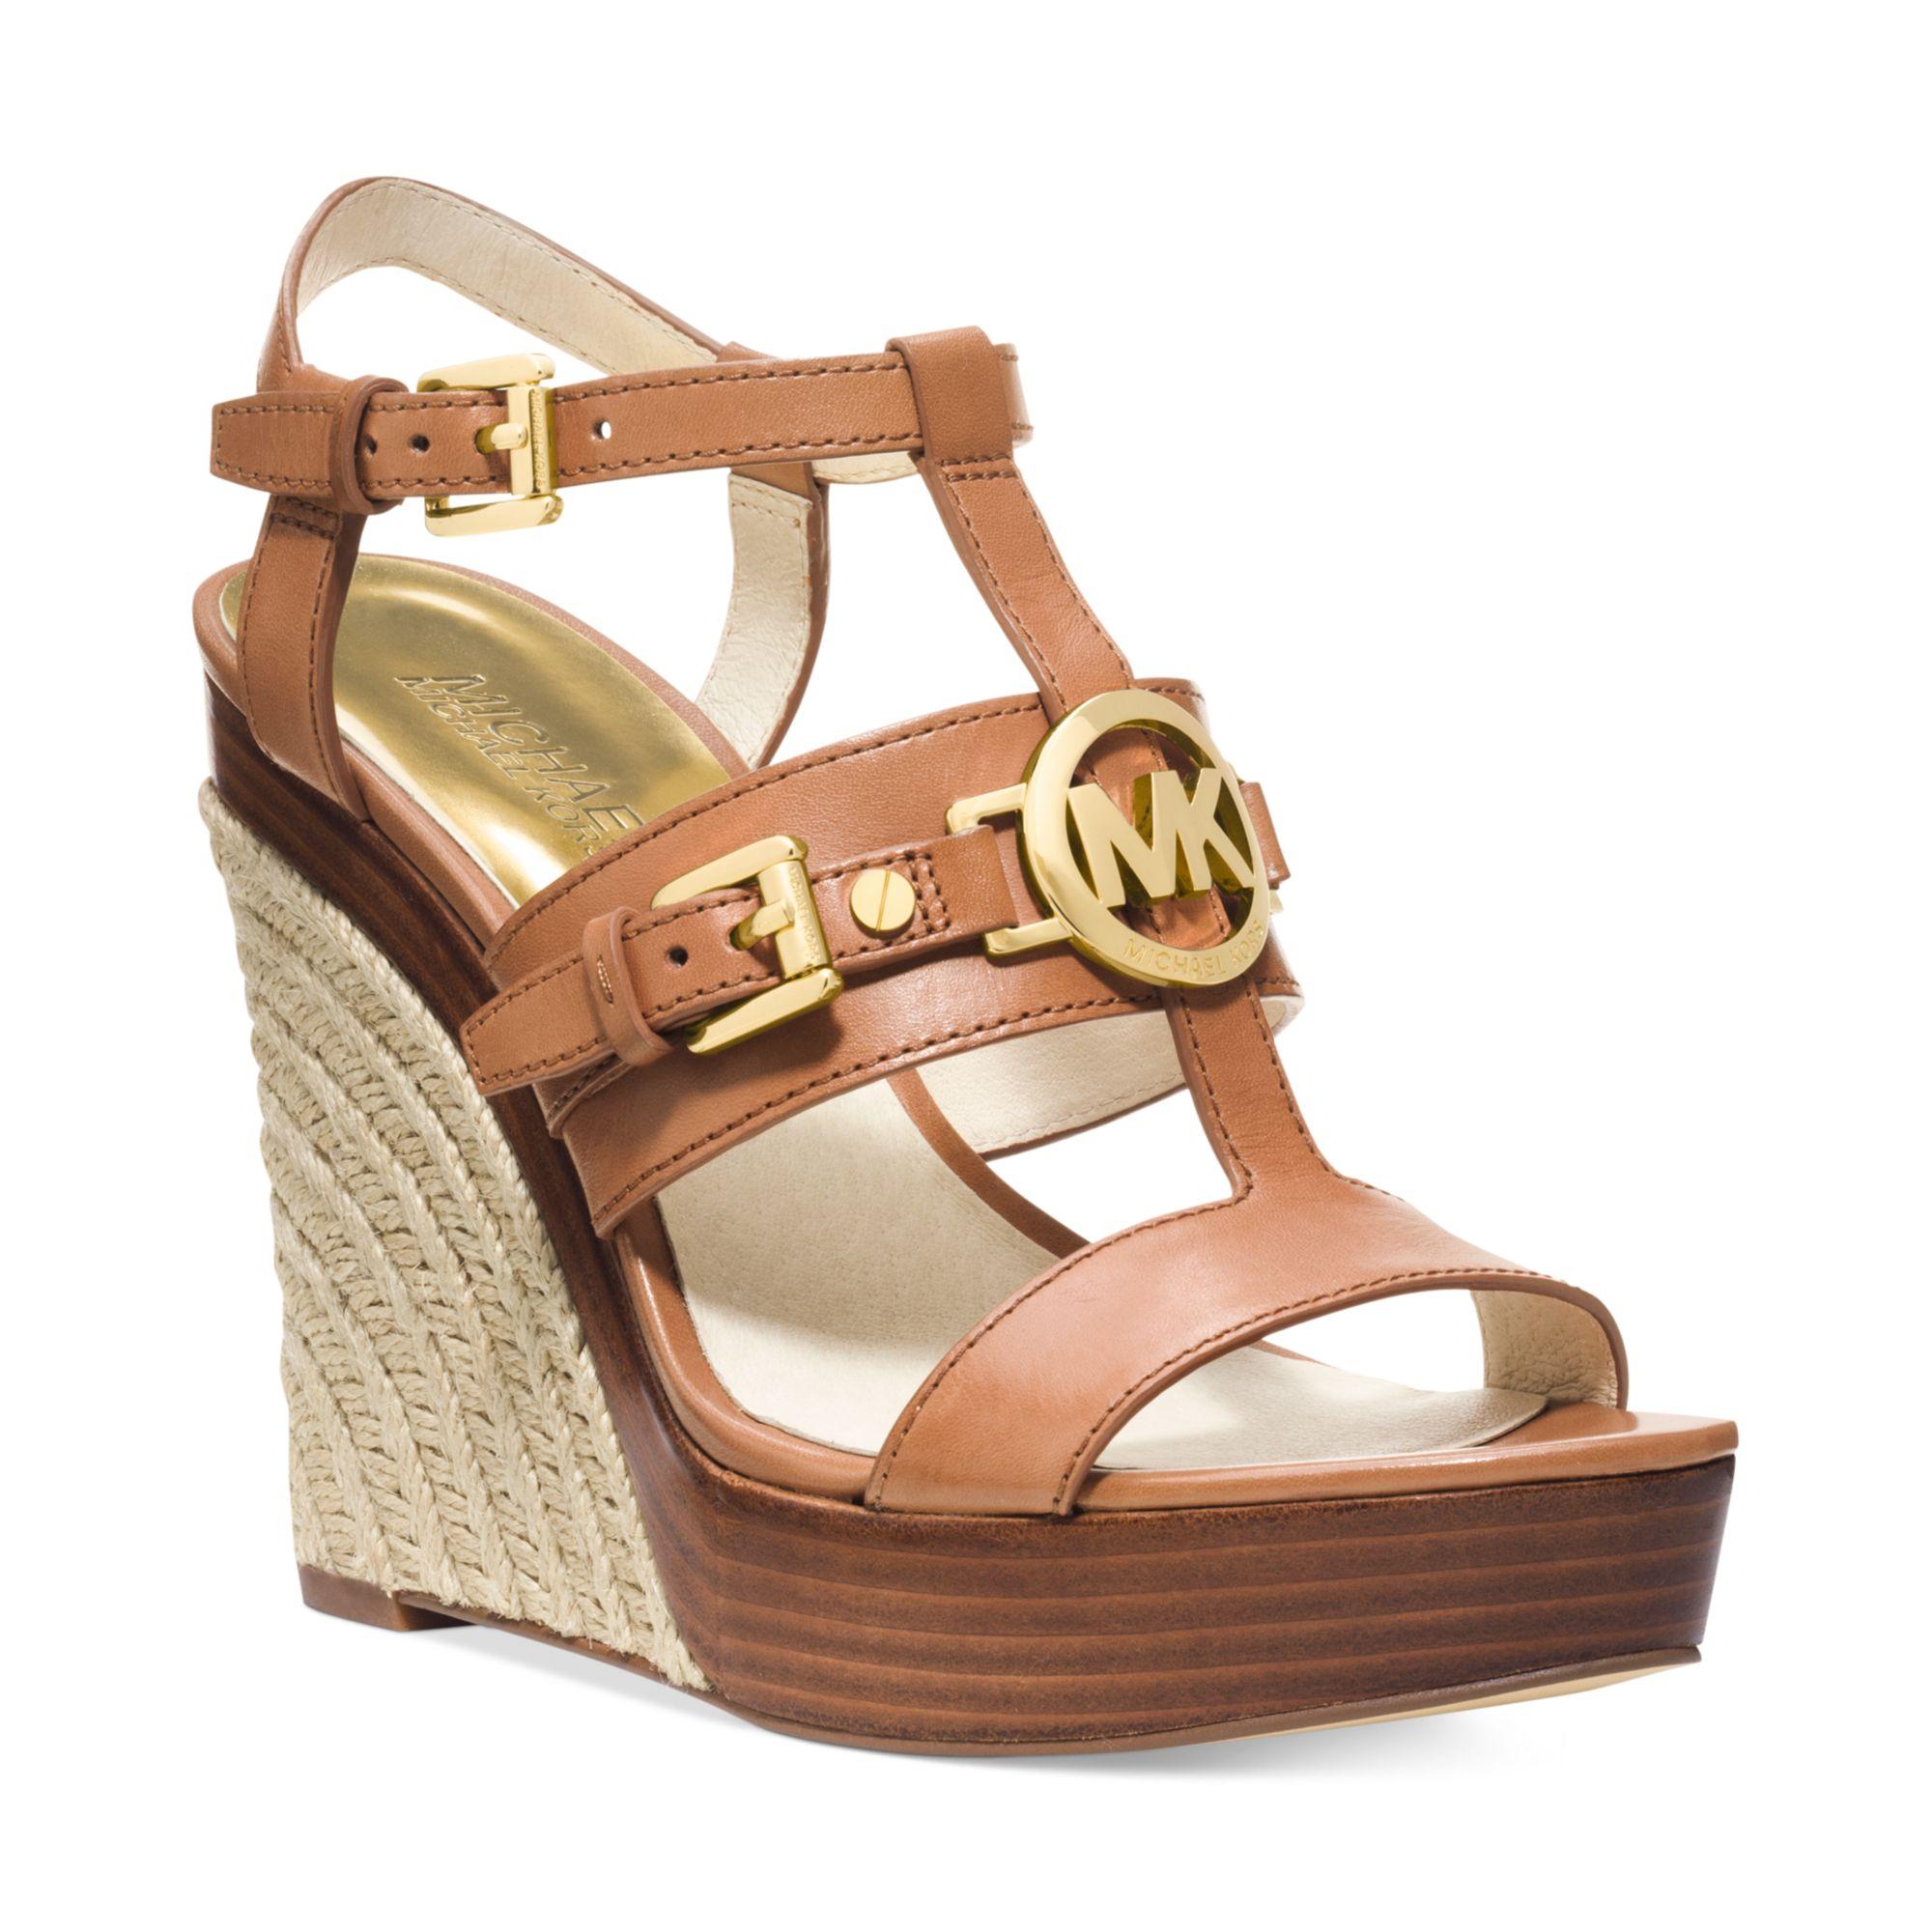 Michael Kors Womens Shoes Uk